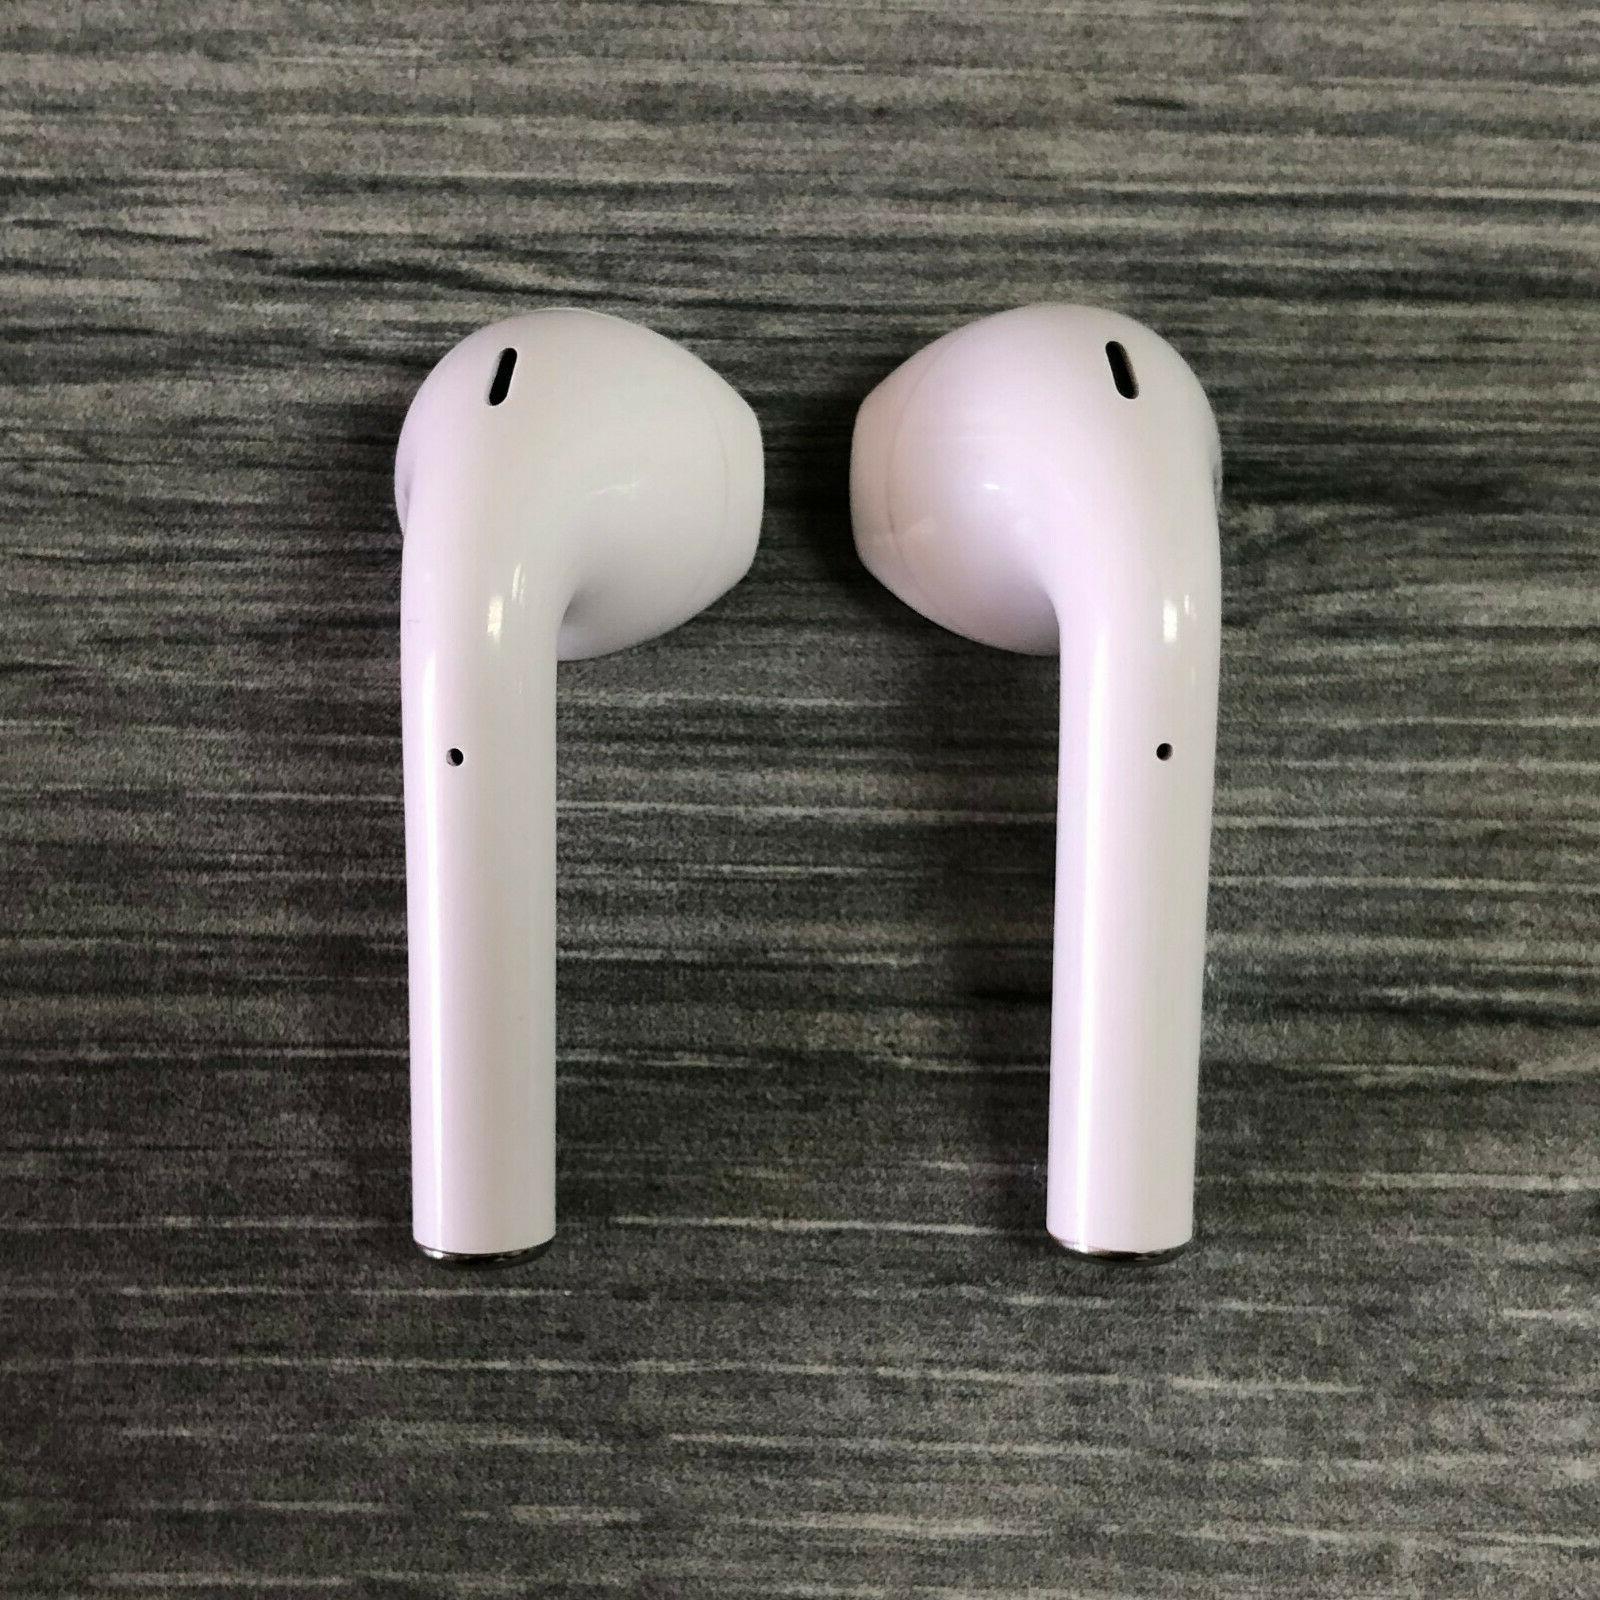 New Premium Grade Headphones 5.0 with Case